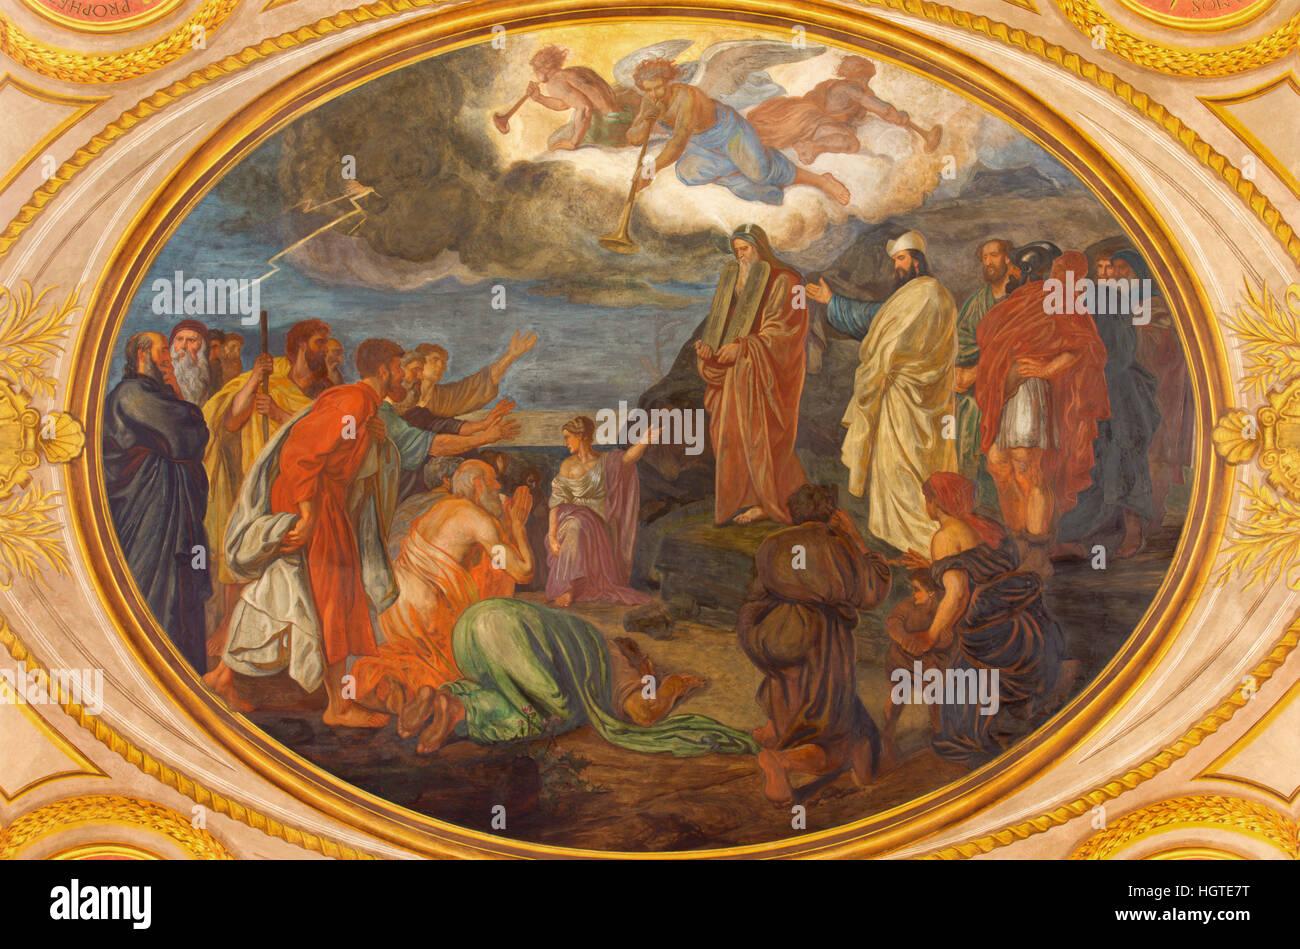 VIENNA, AUSTRIA - DECEMBER 19, 2016: Moses on the Mount Sinai fresco in church Kirche St. Laurenz (Schottenfelder - Stock Image